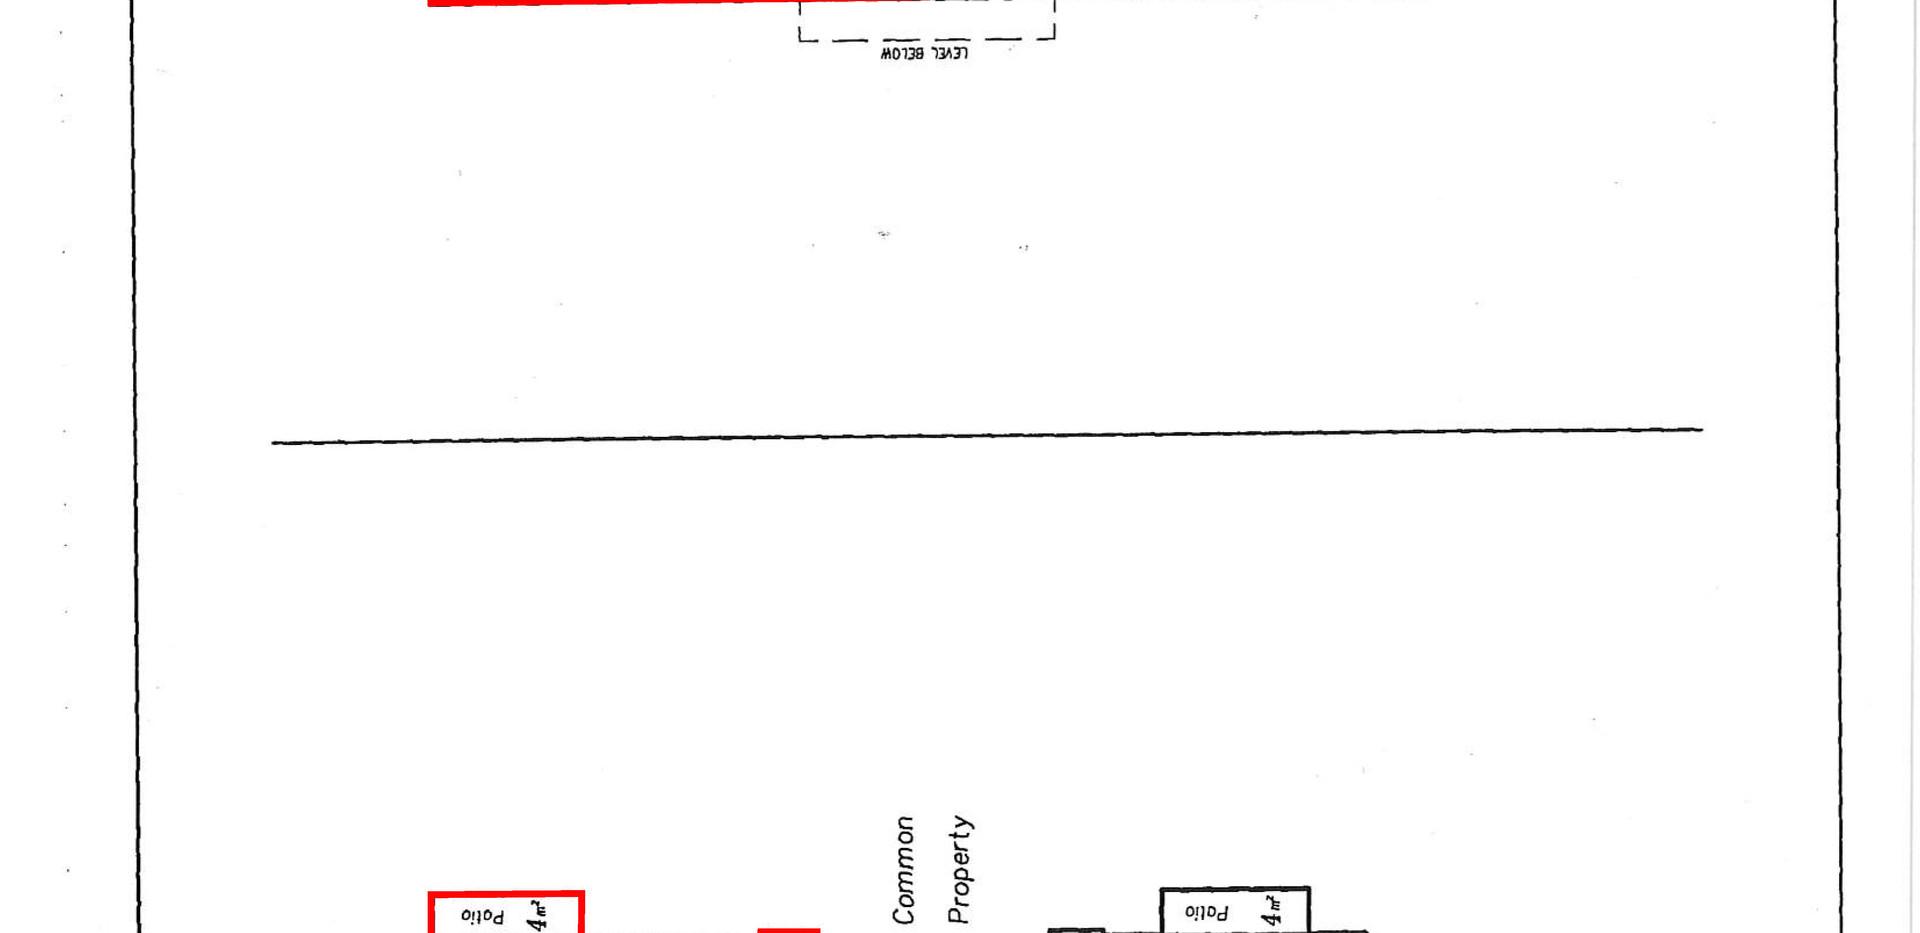 1_13 Maltman SP 181154 page 2 outlined.j